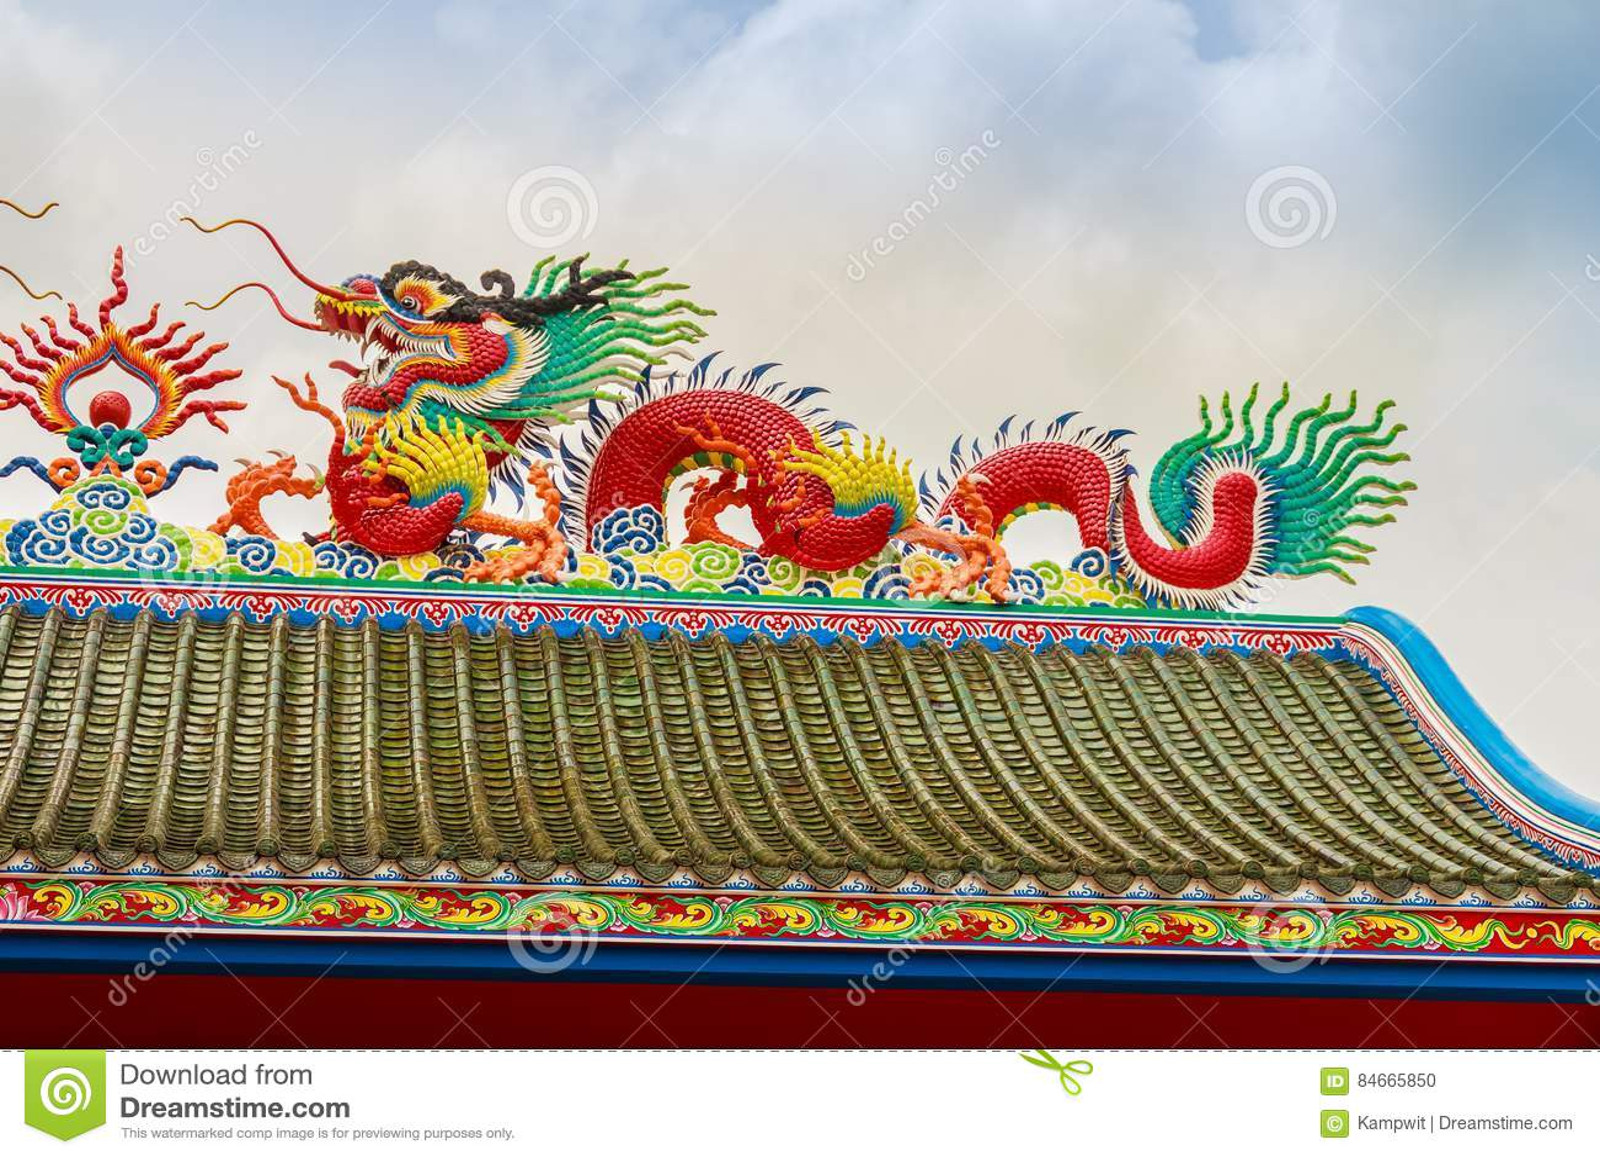 Mooi Chinees drakenbeeldhouwwerk bij de Chinese tempel van Anek Kusala Sala Viharn Sien in Pattaya, Thailand Het was gebouwde in